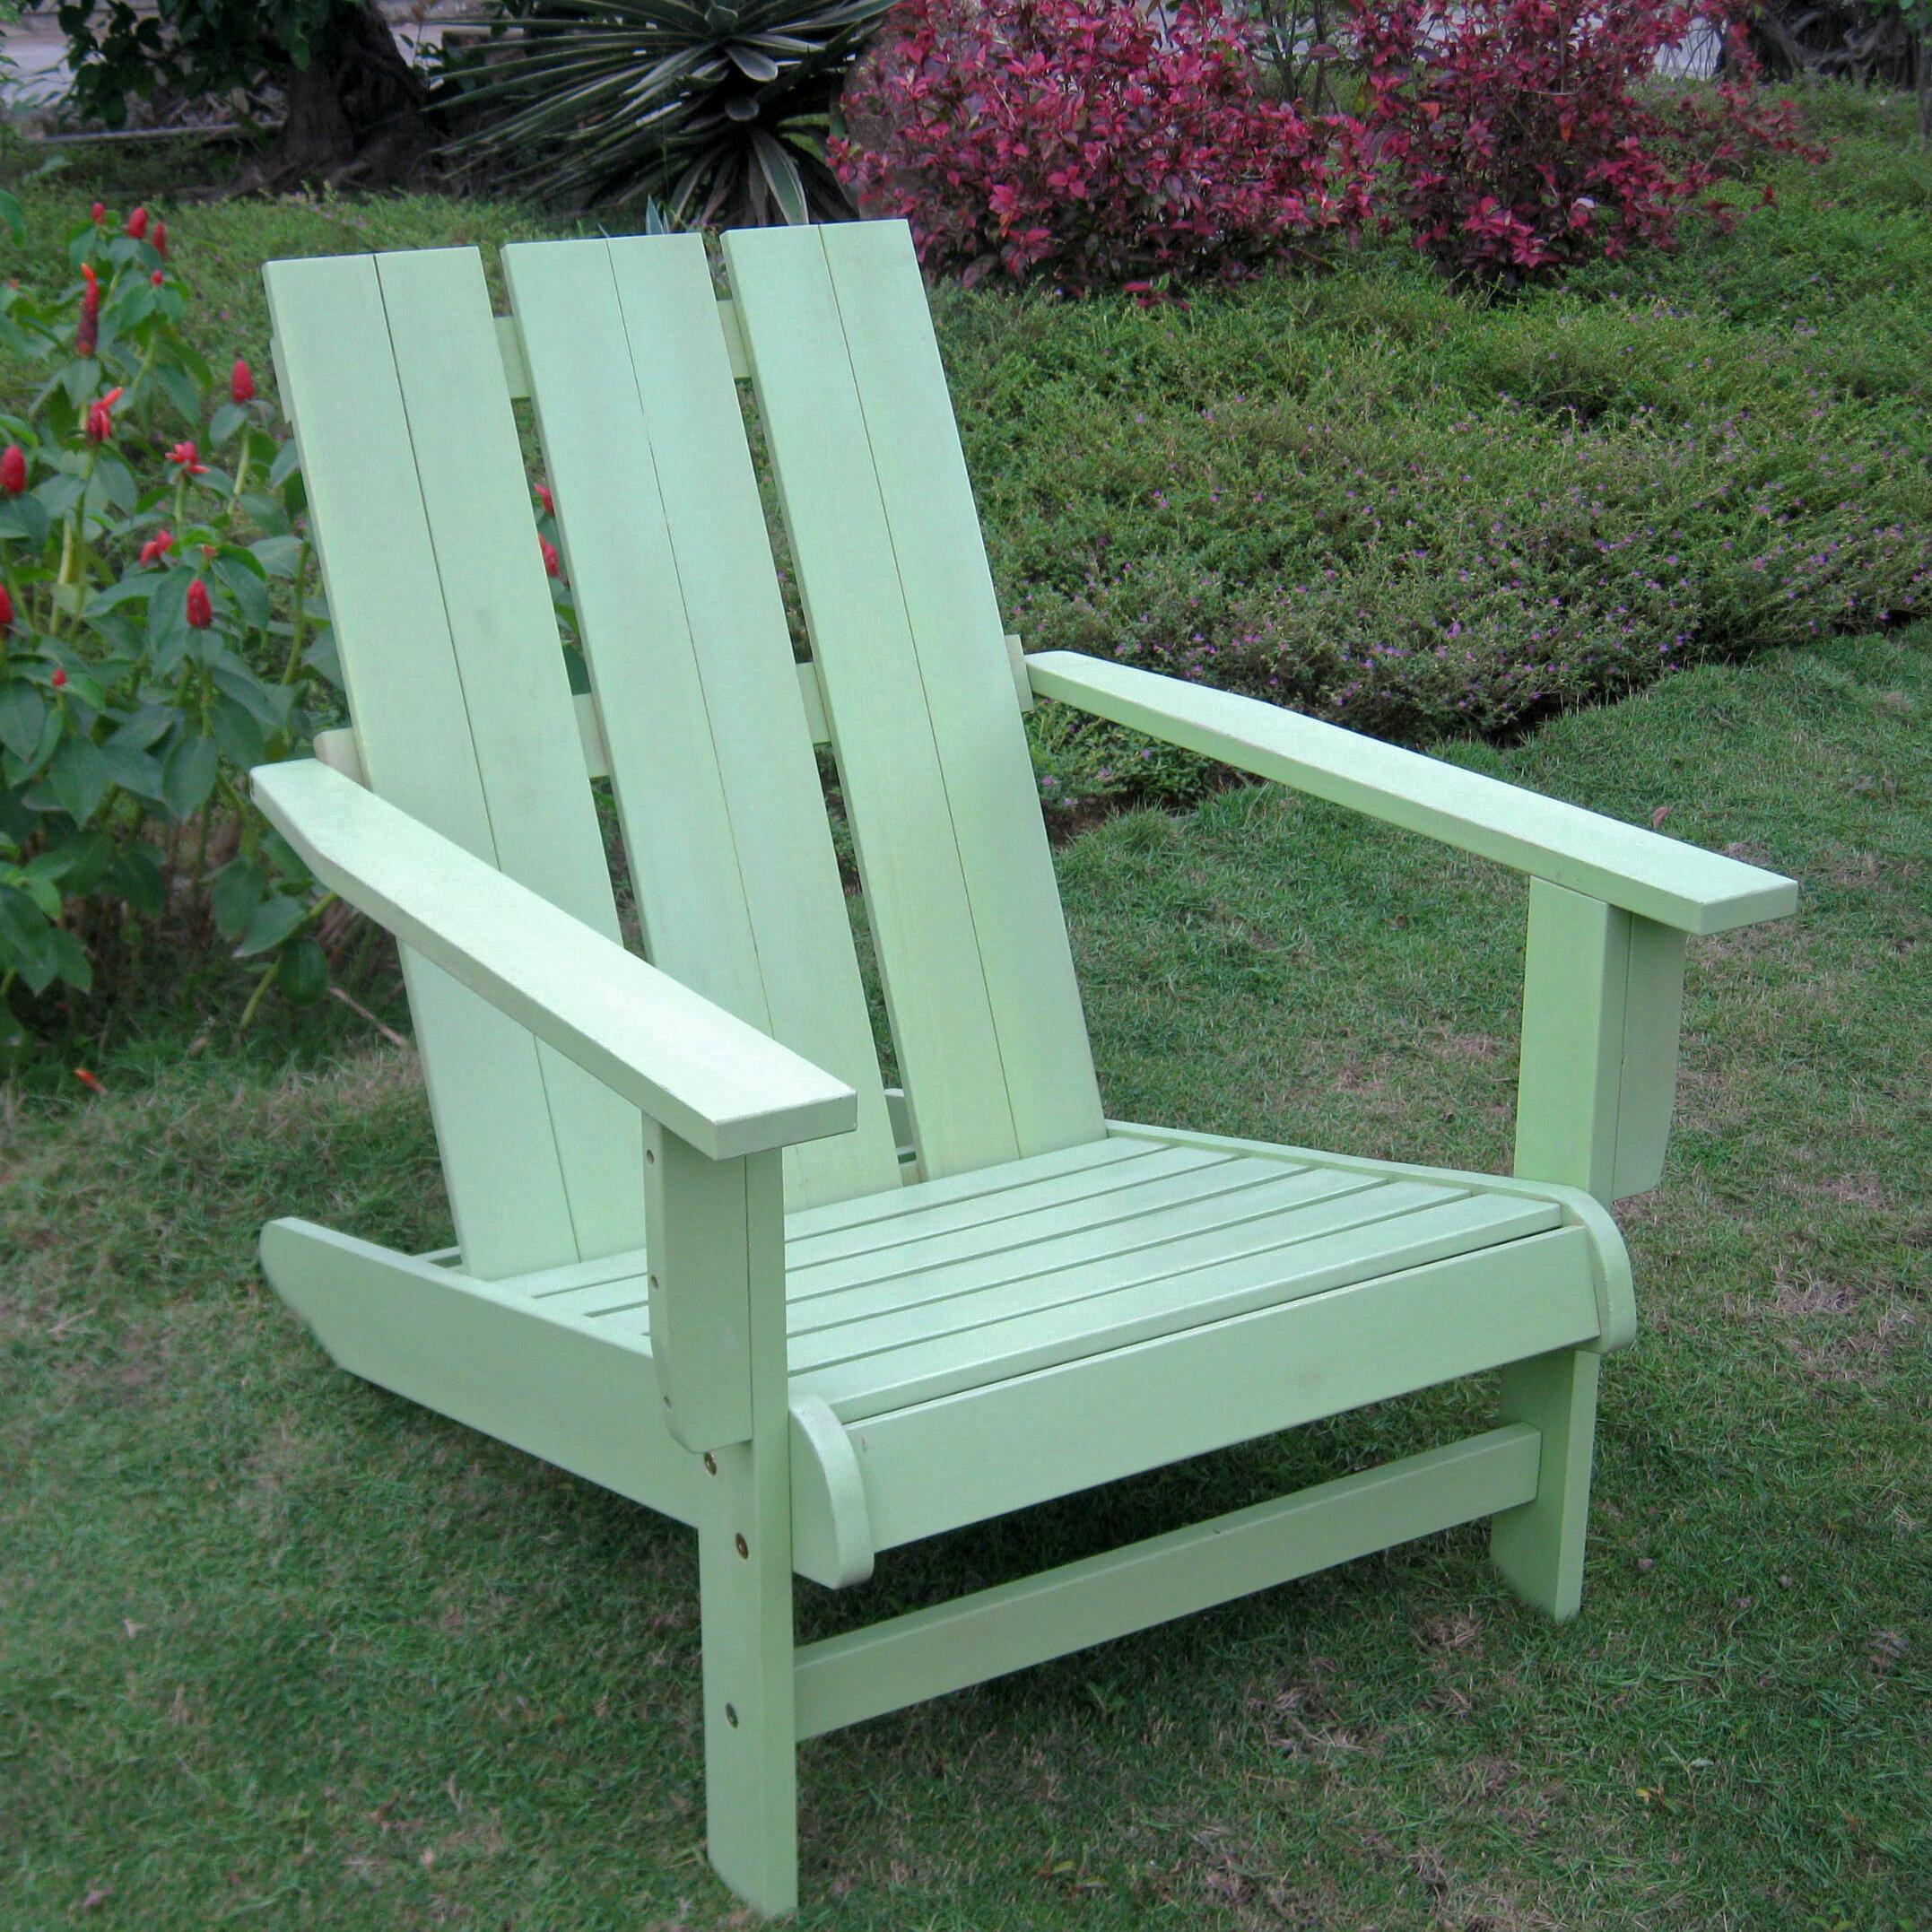 Acacia Green Wood Adirondack Chairs You Ll Love In 2021 Wayfair